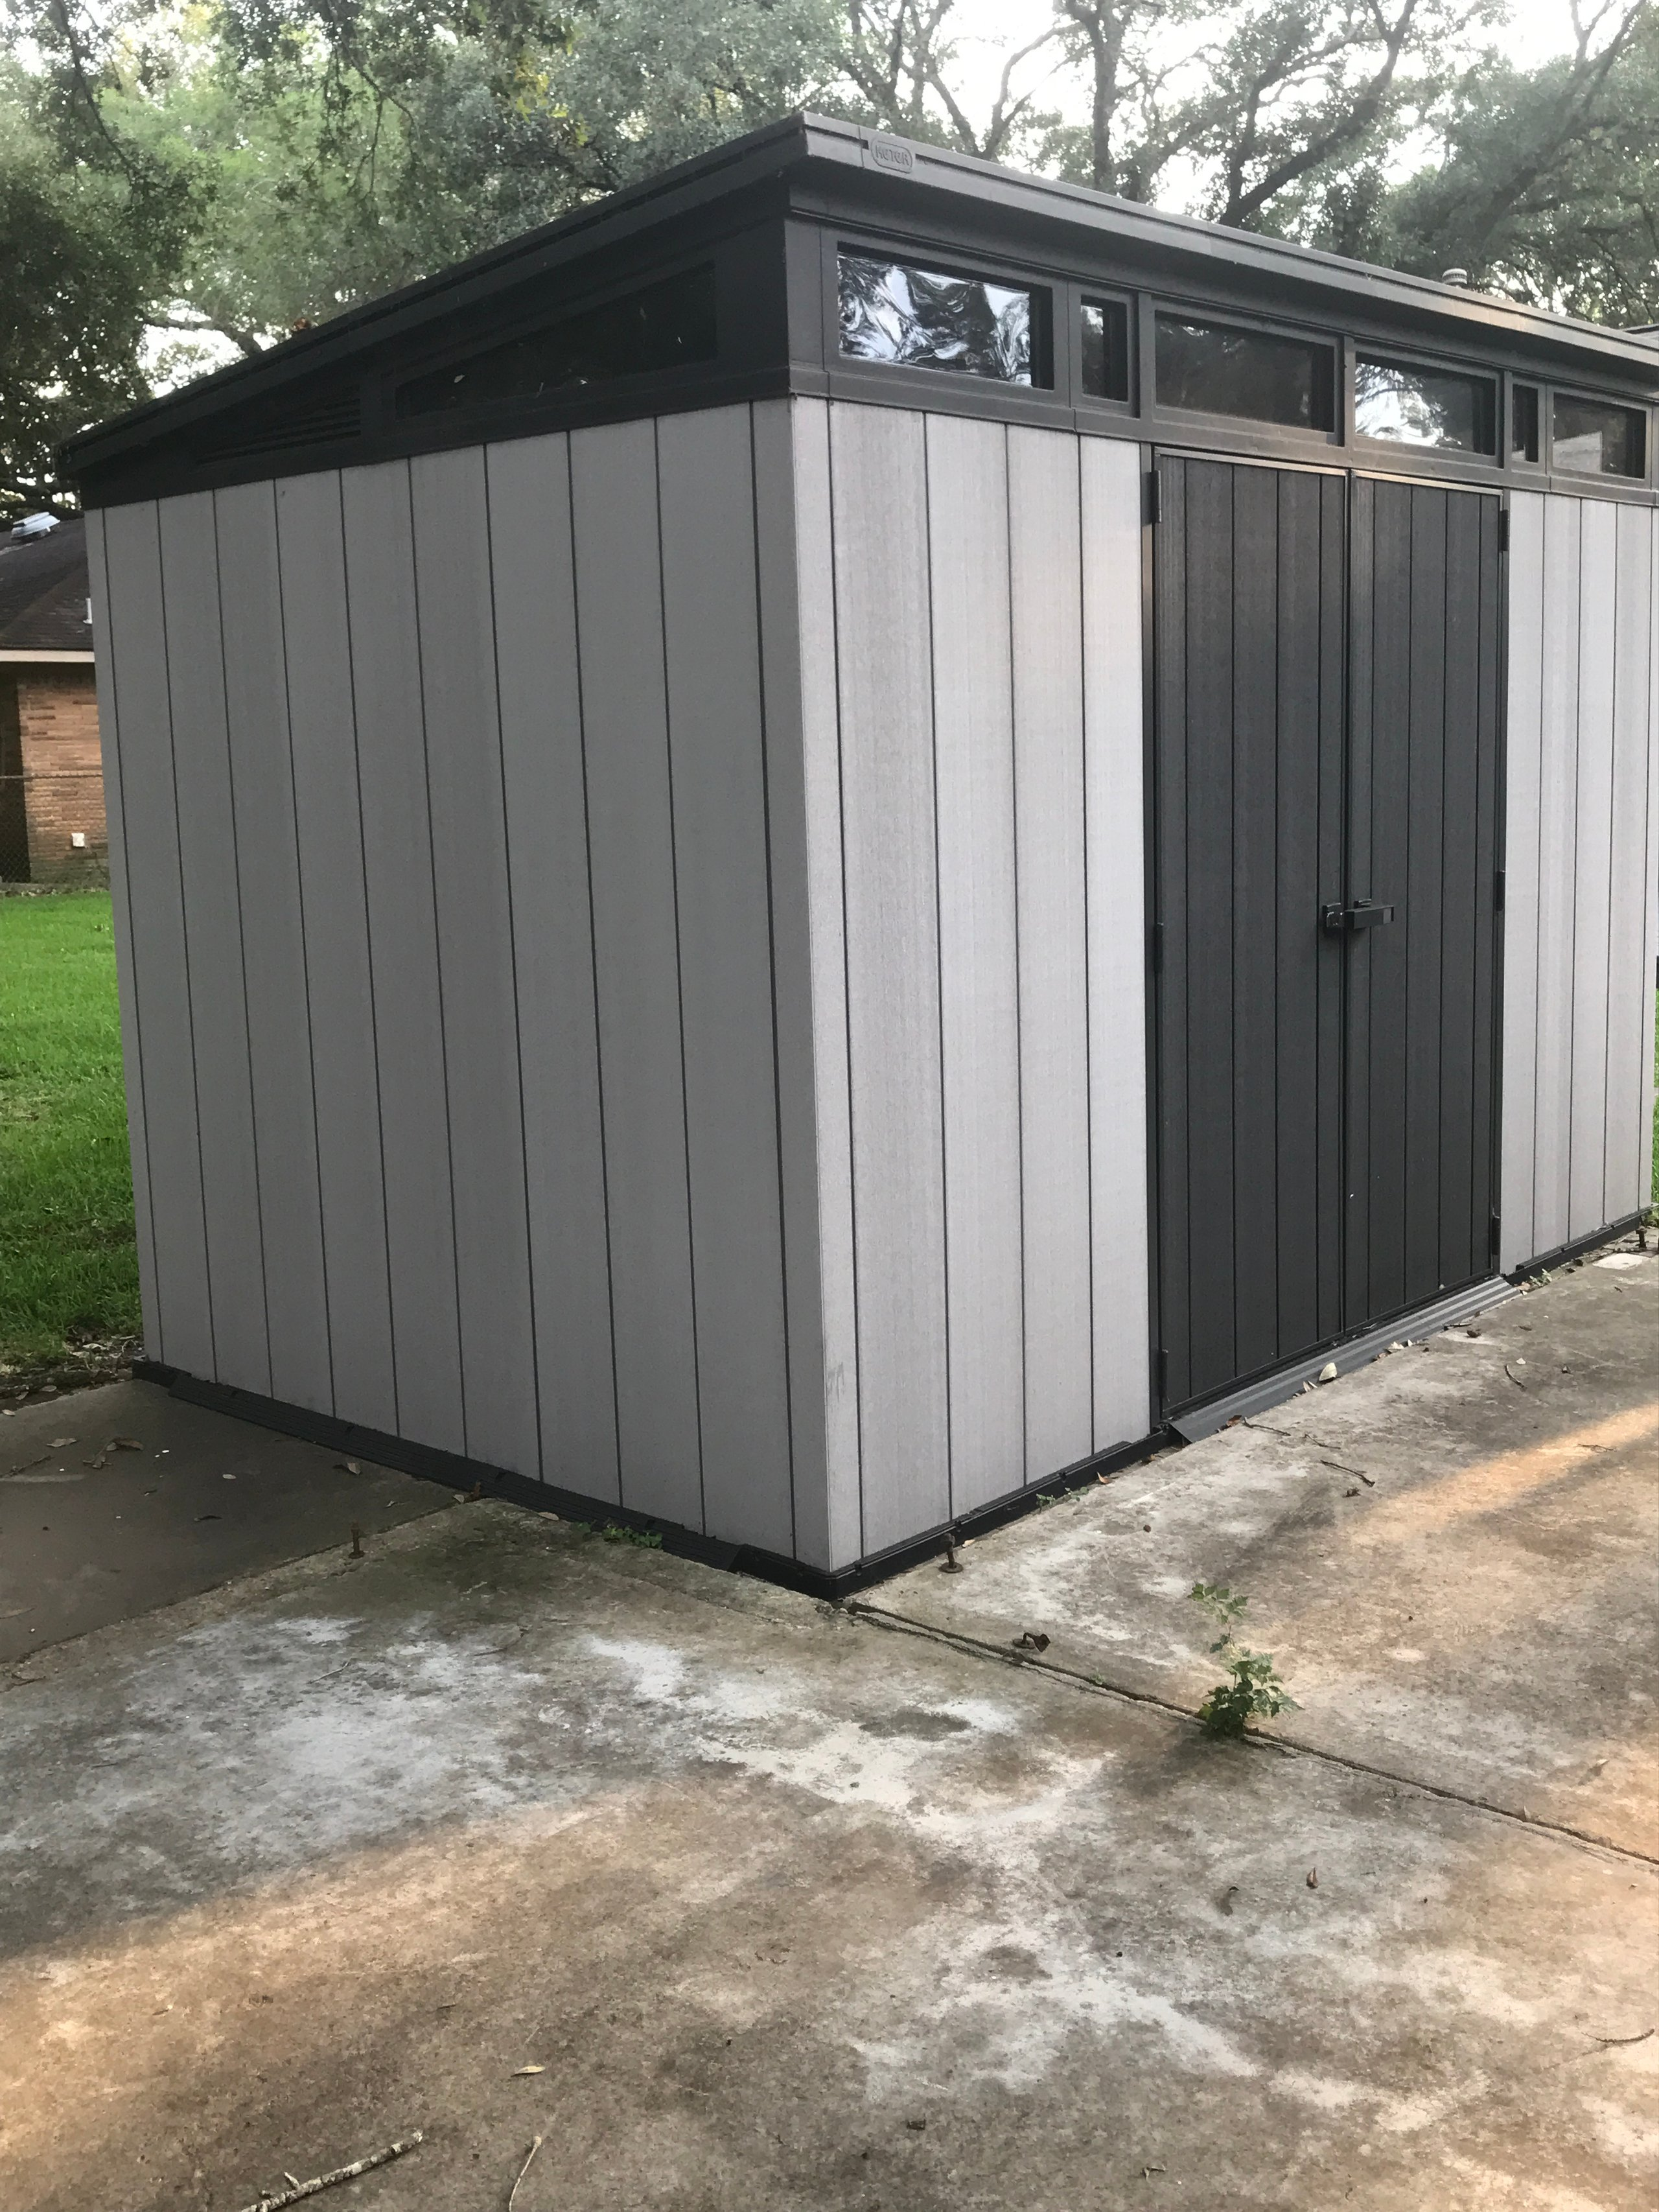 11x6 Shed self storage unit